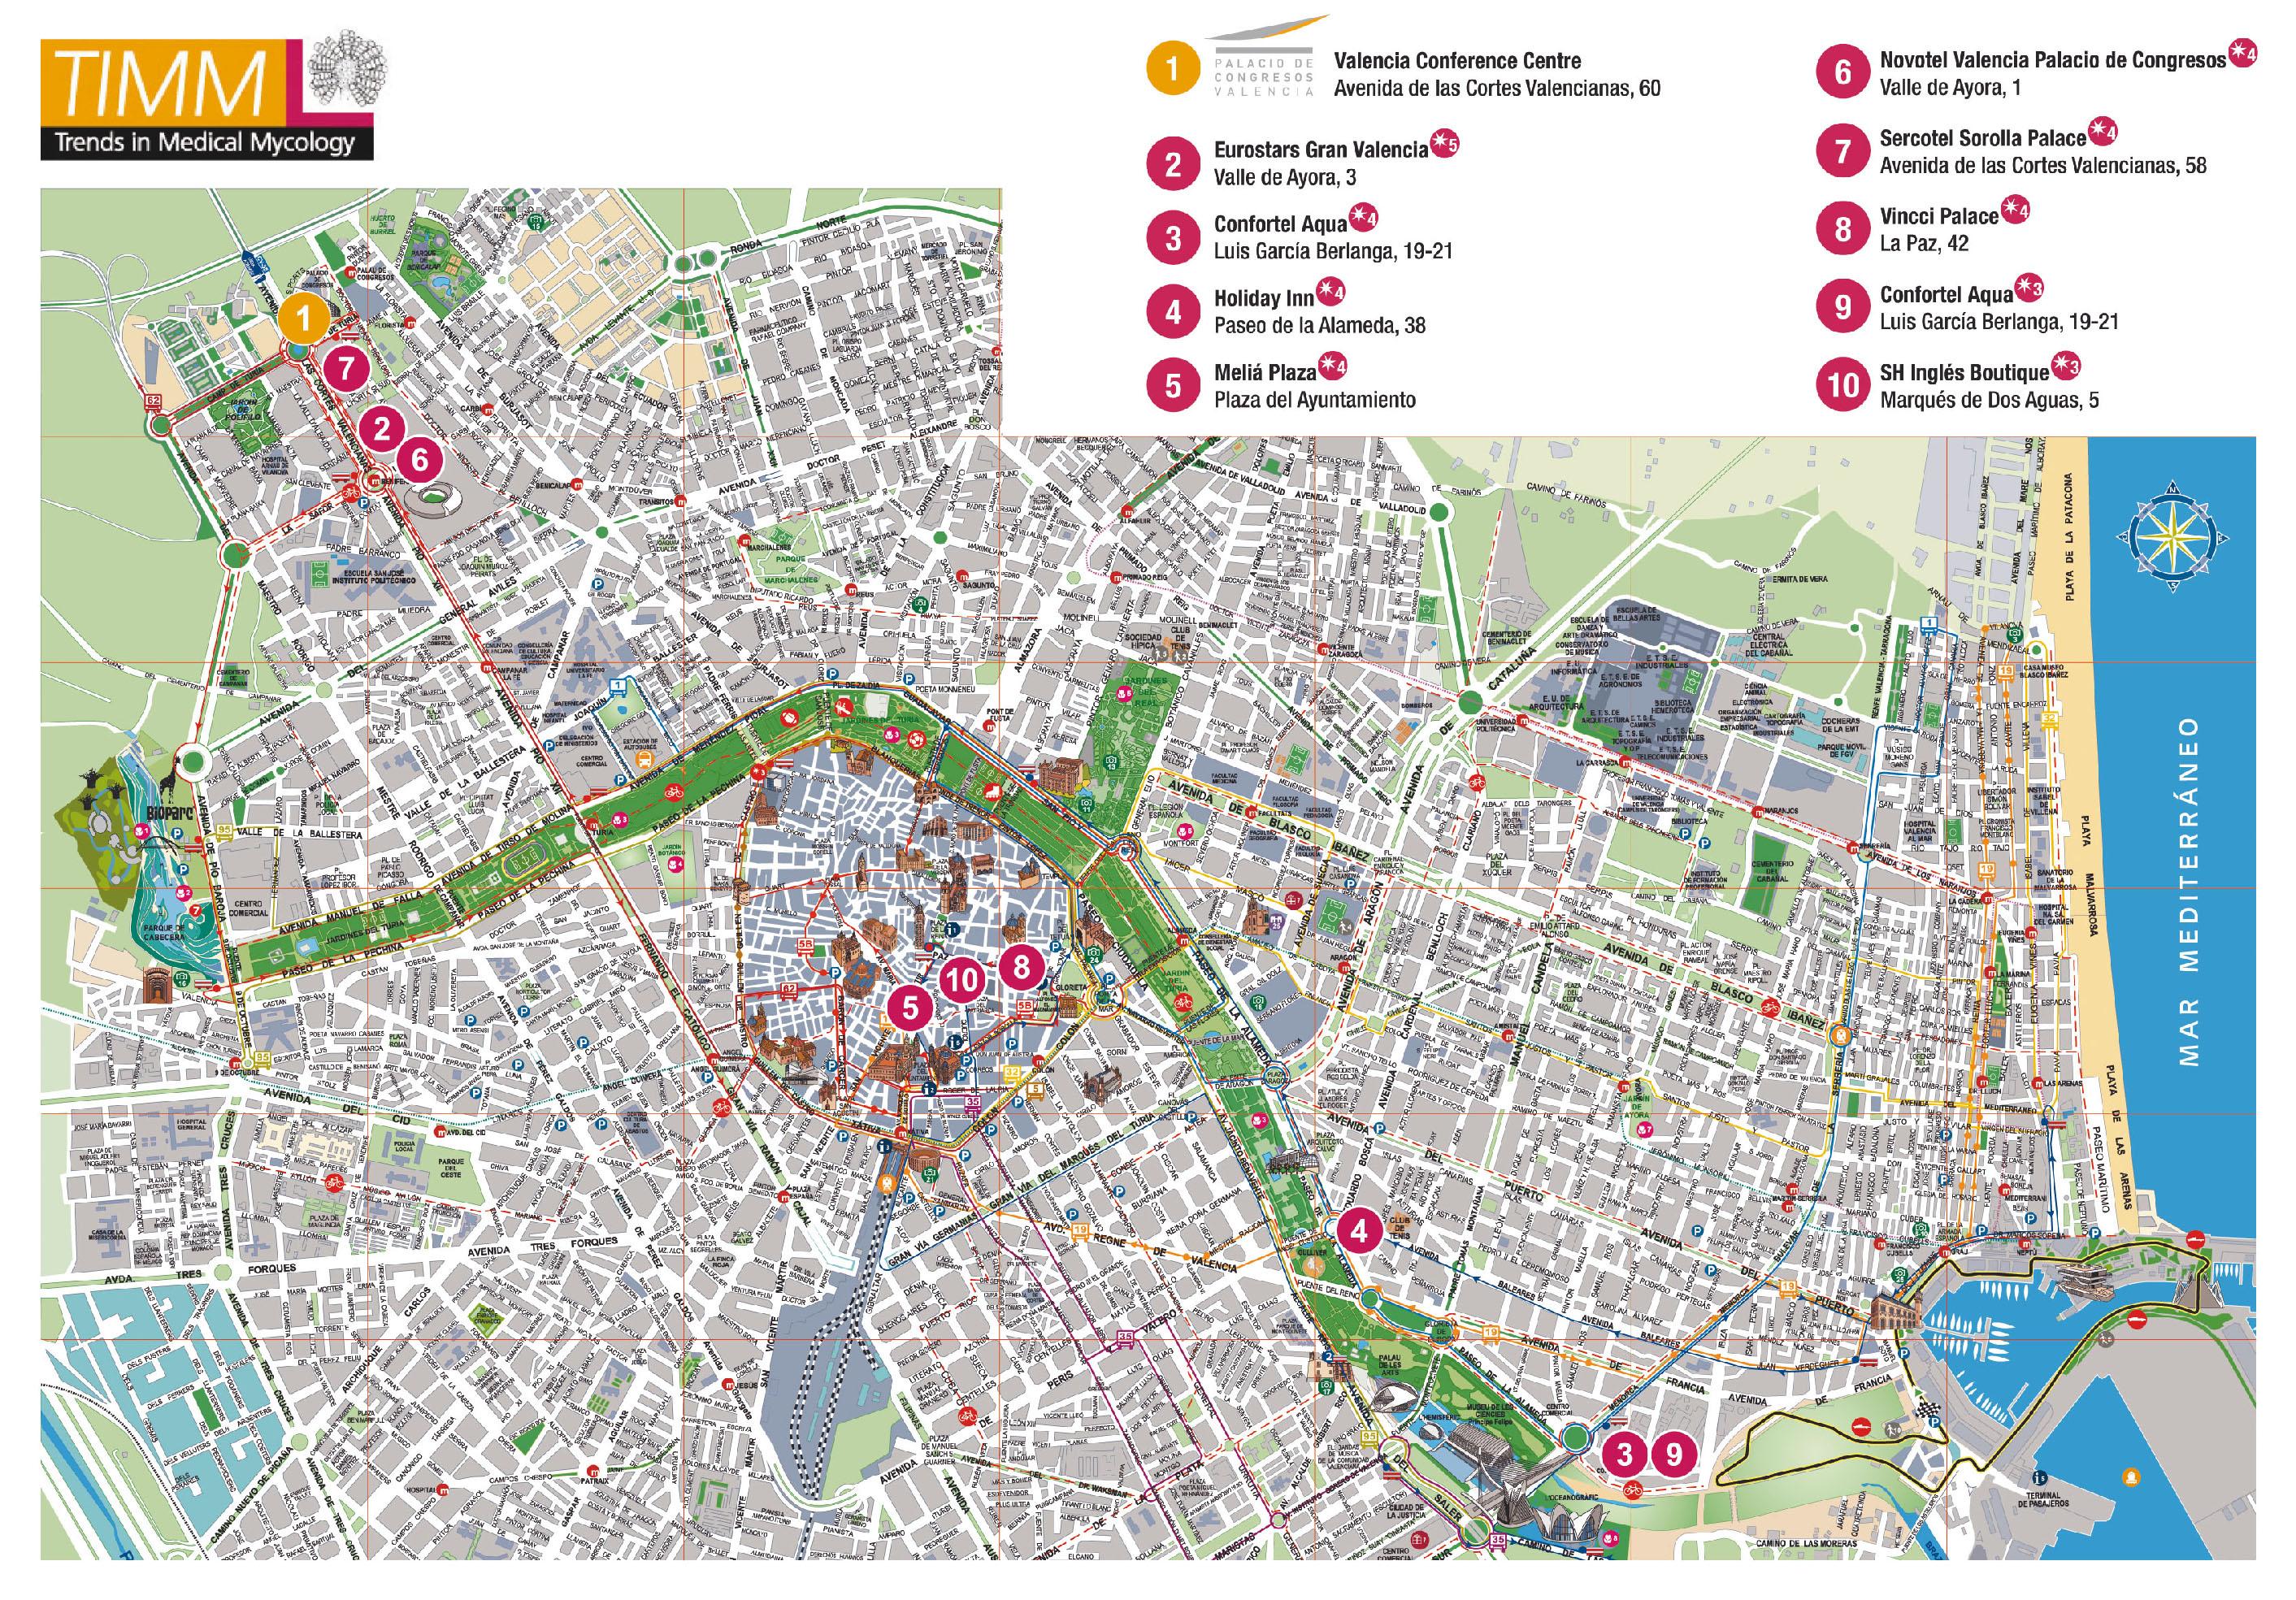 Map of Valencia 2011